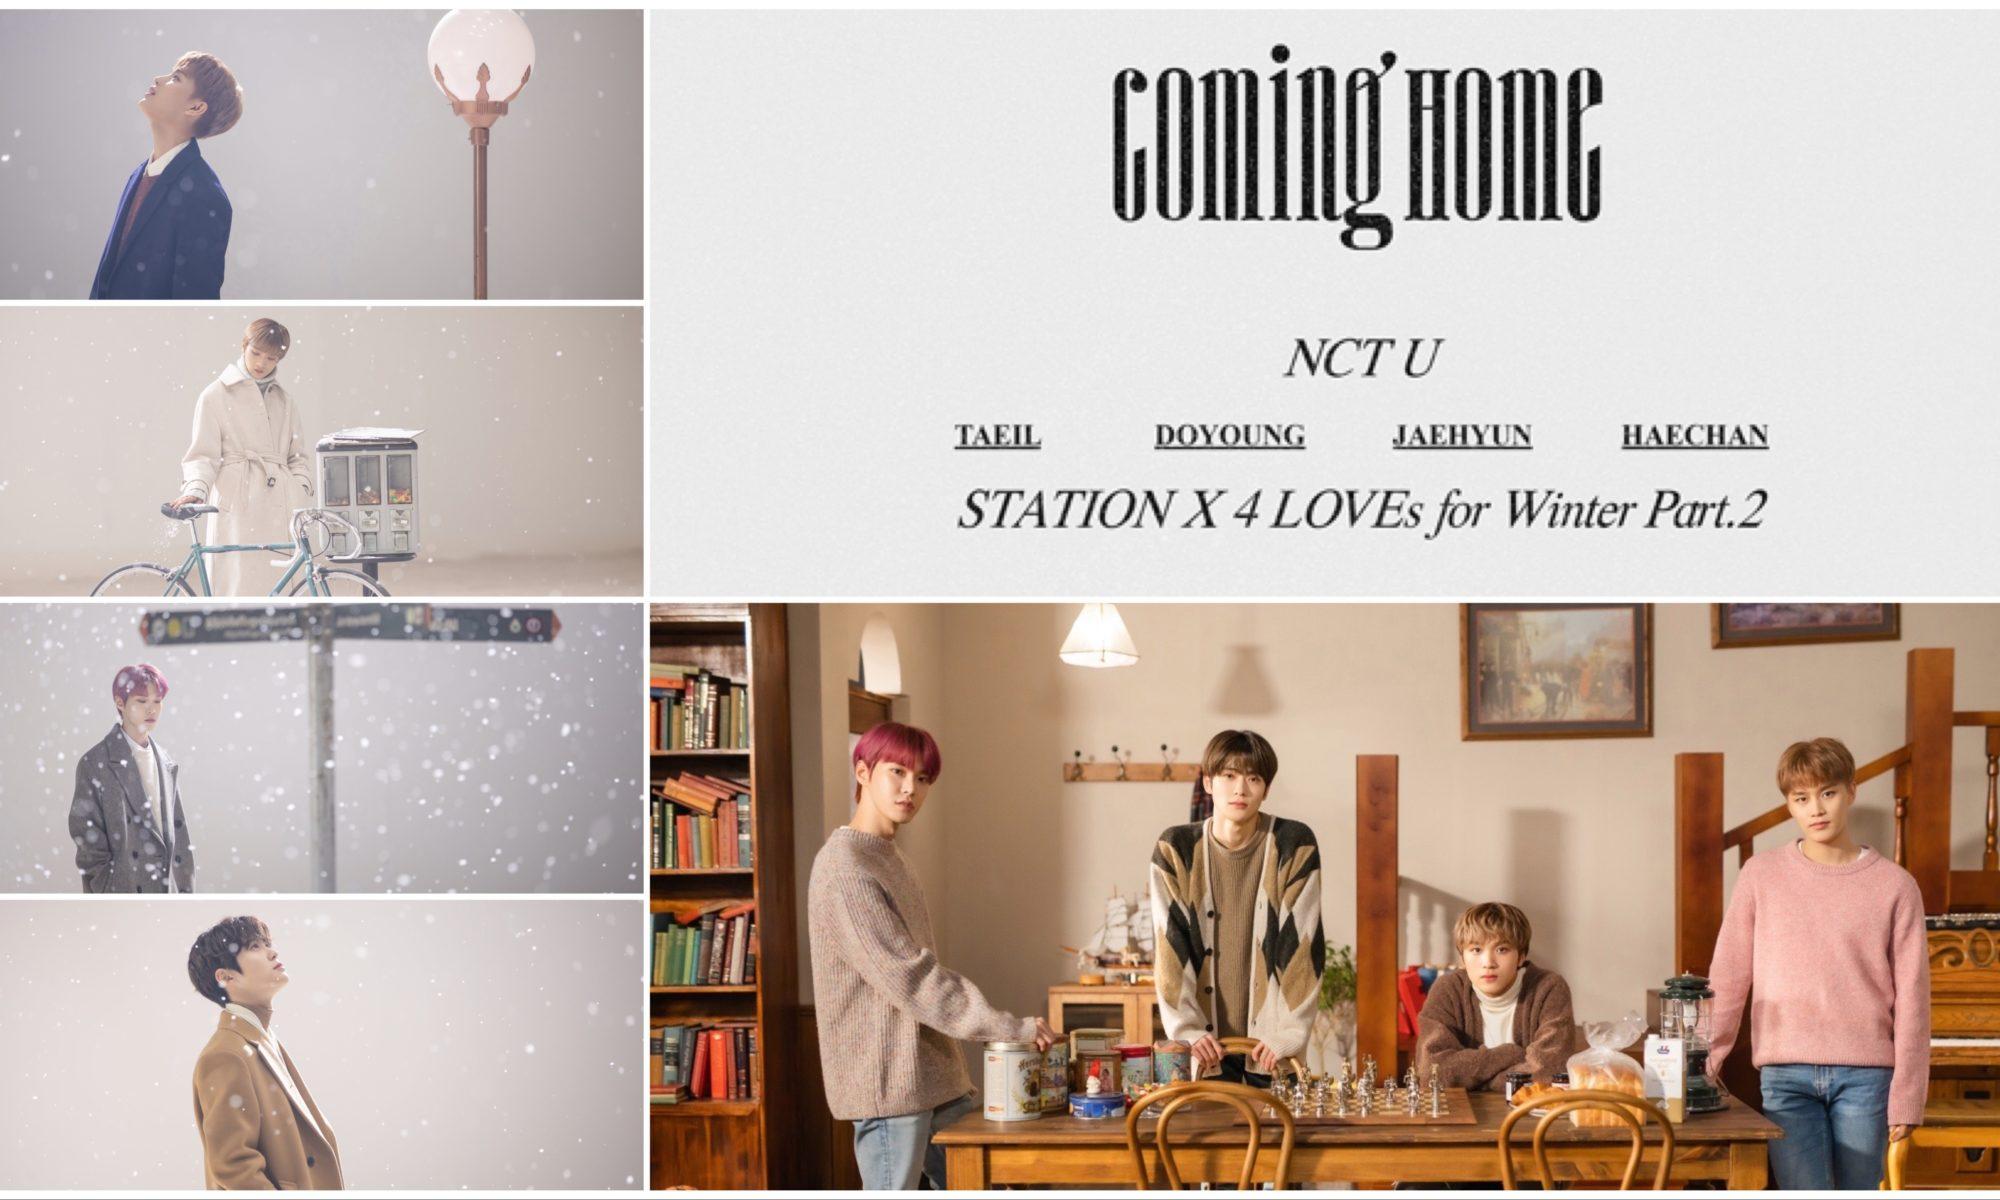 NCT U Coming Home